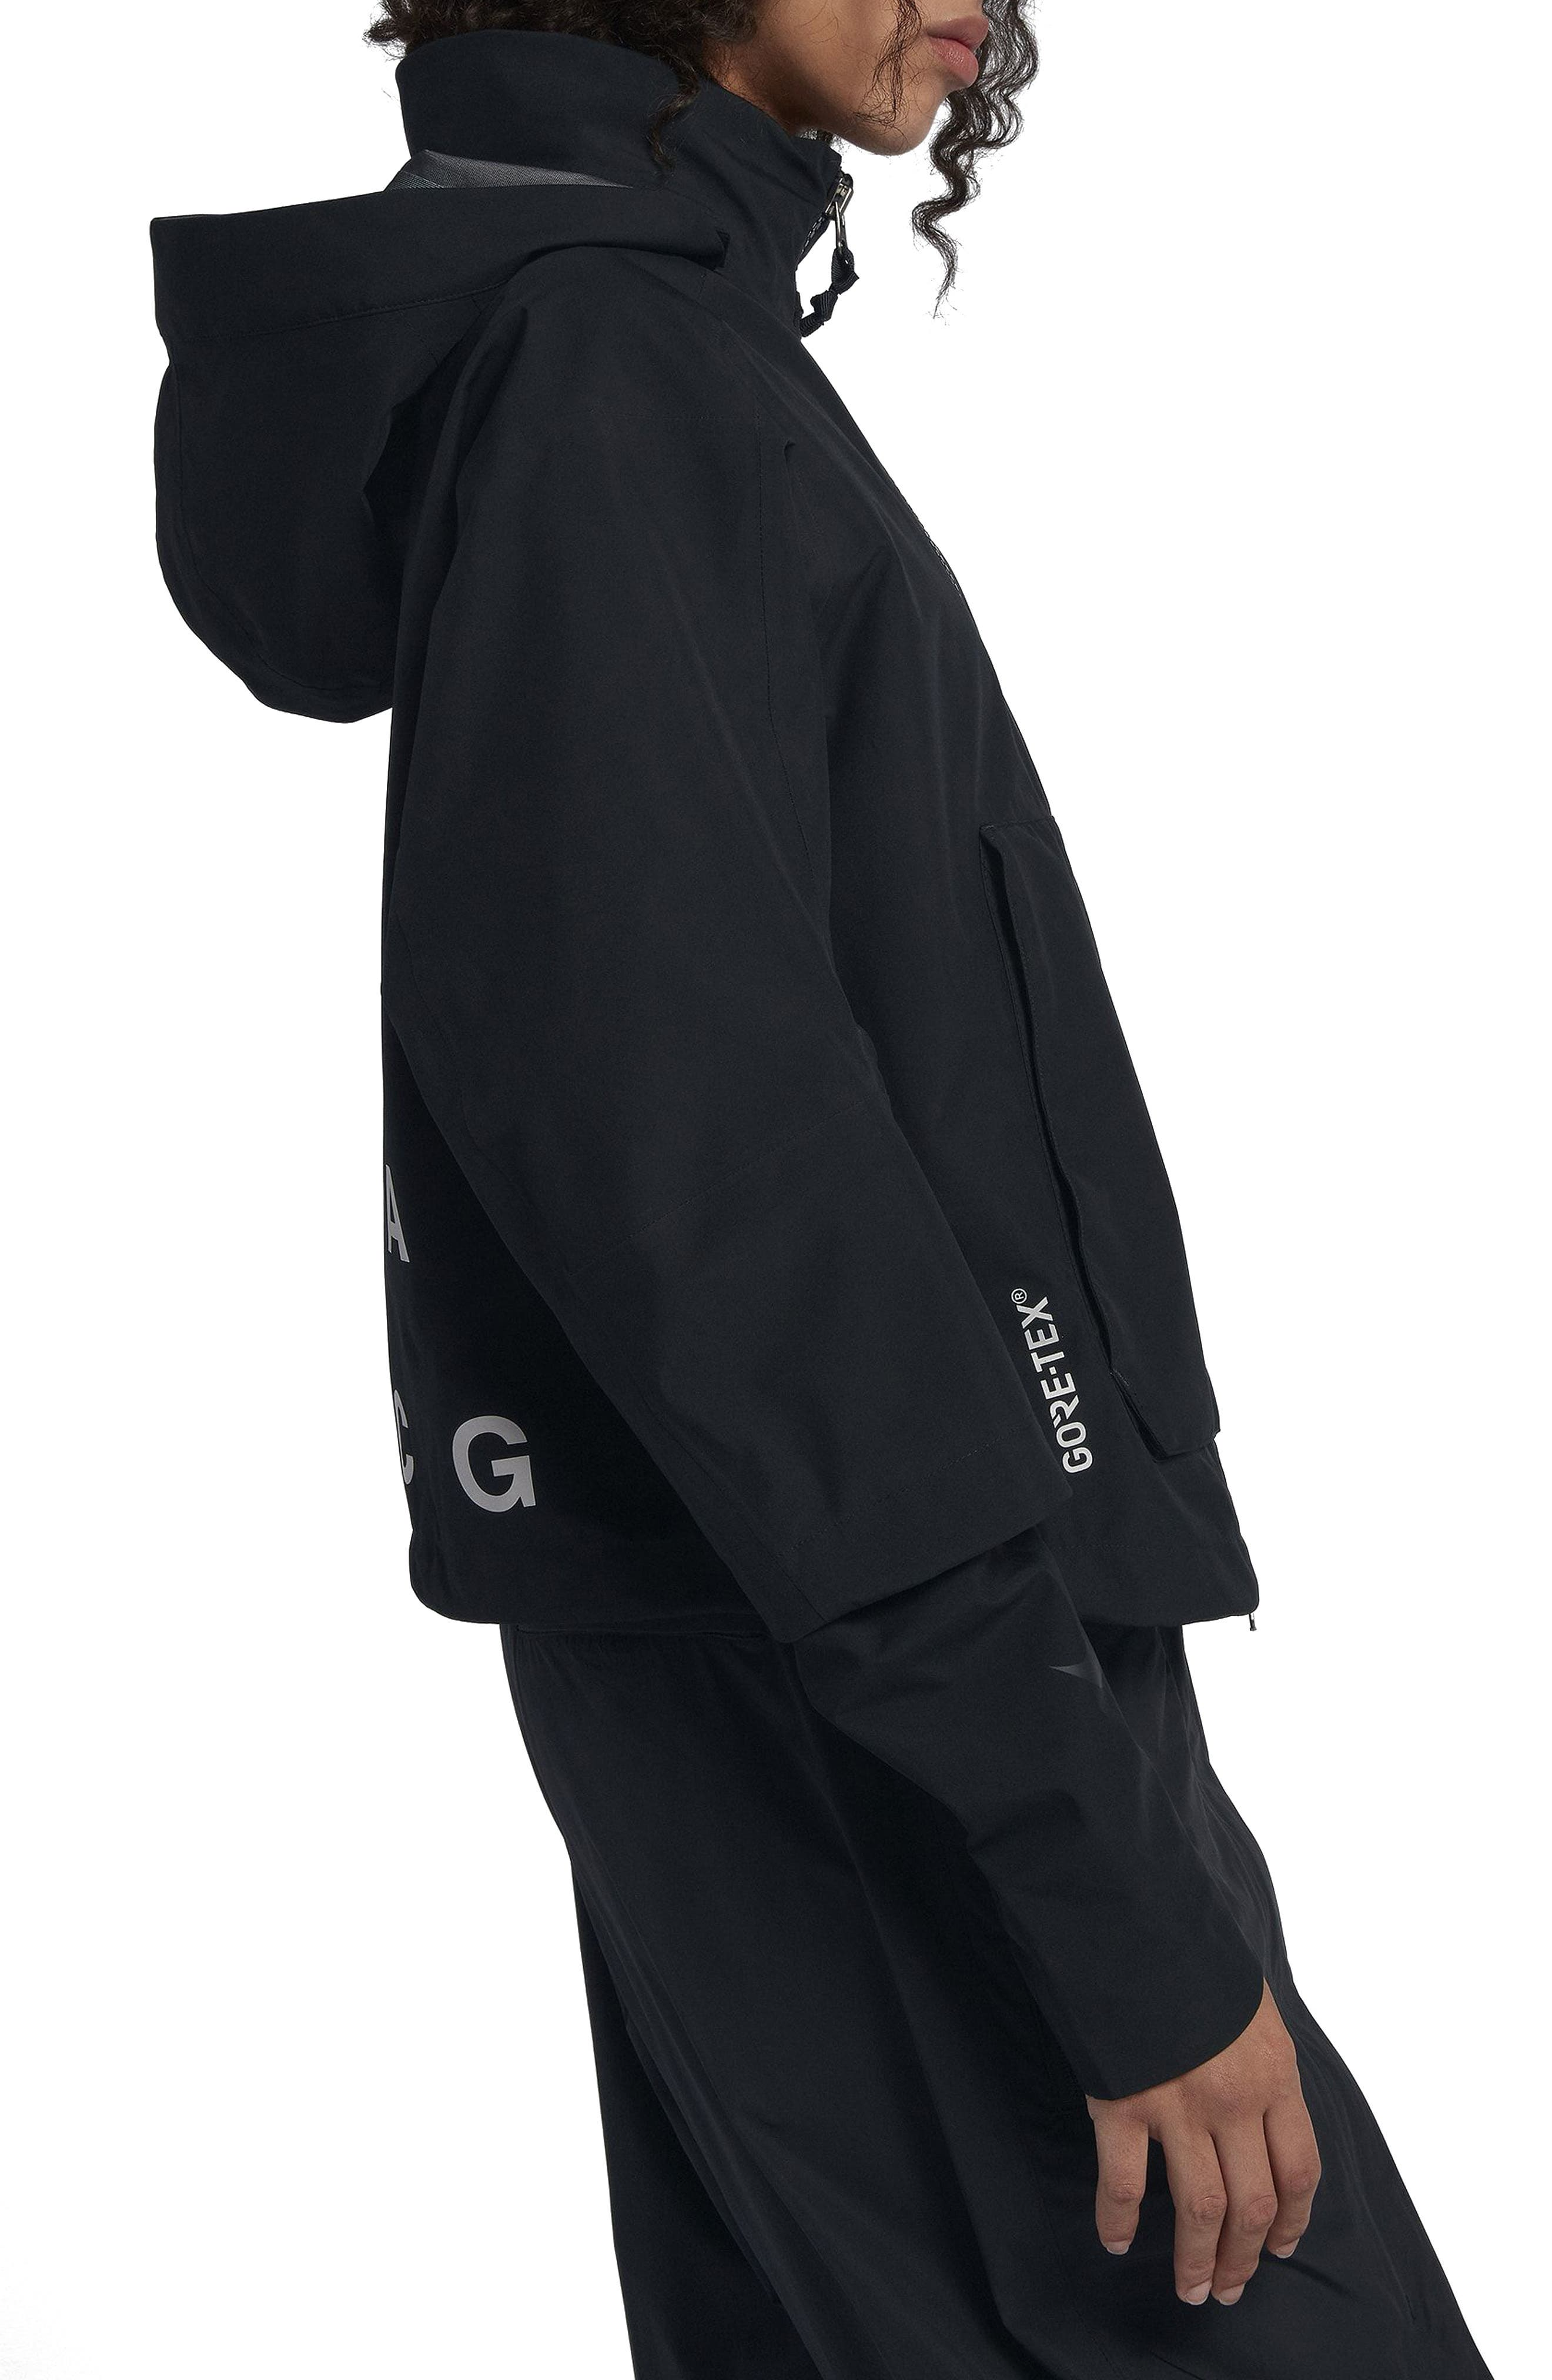 NikeLab ACG Gore-Tex<sup>®</sup> Women's Jacket,                             Alternate thumbnail 4, color,                             010